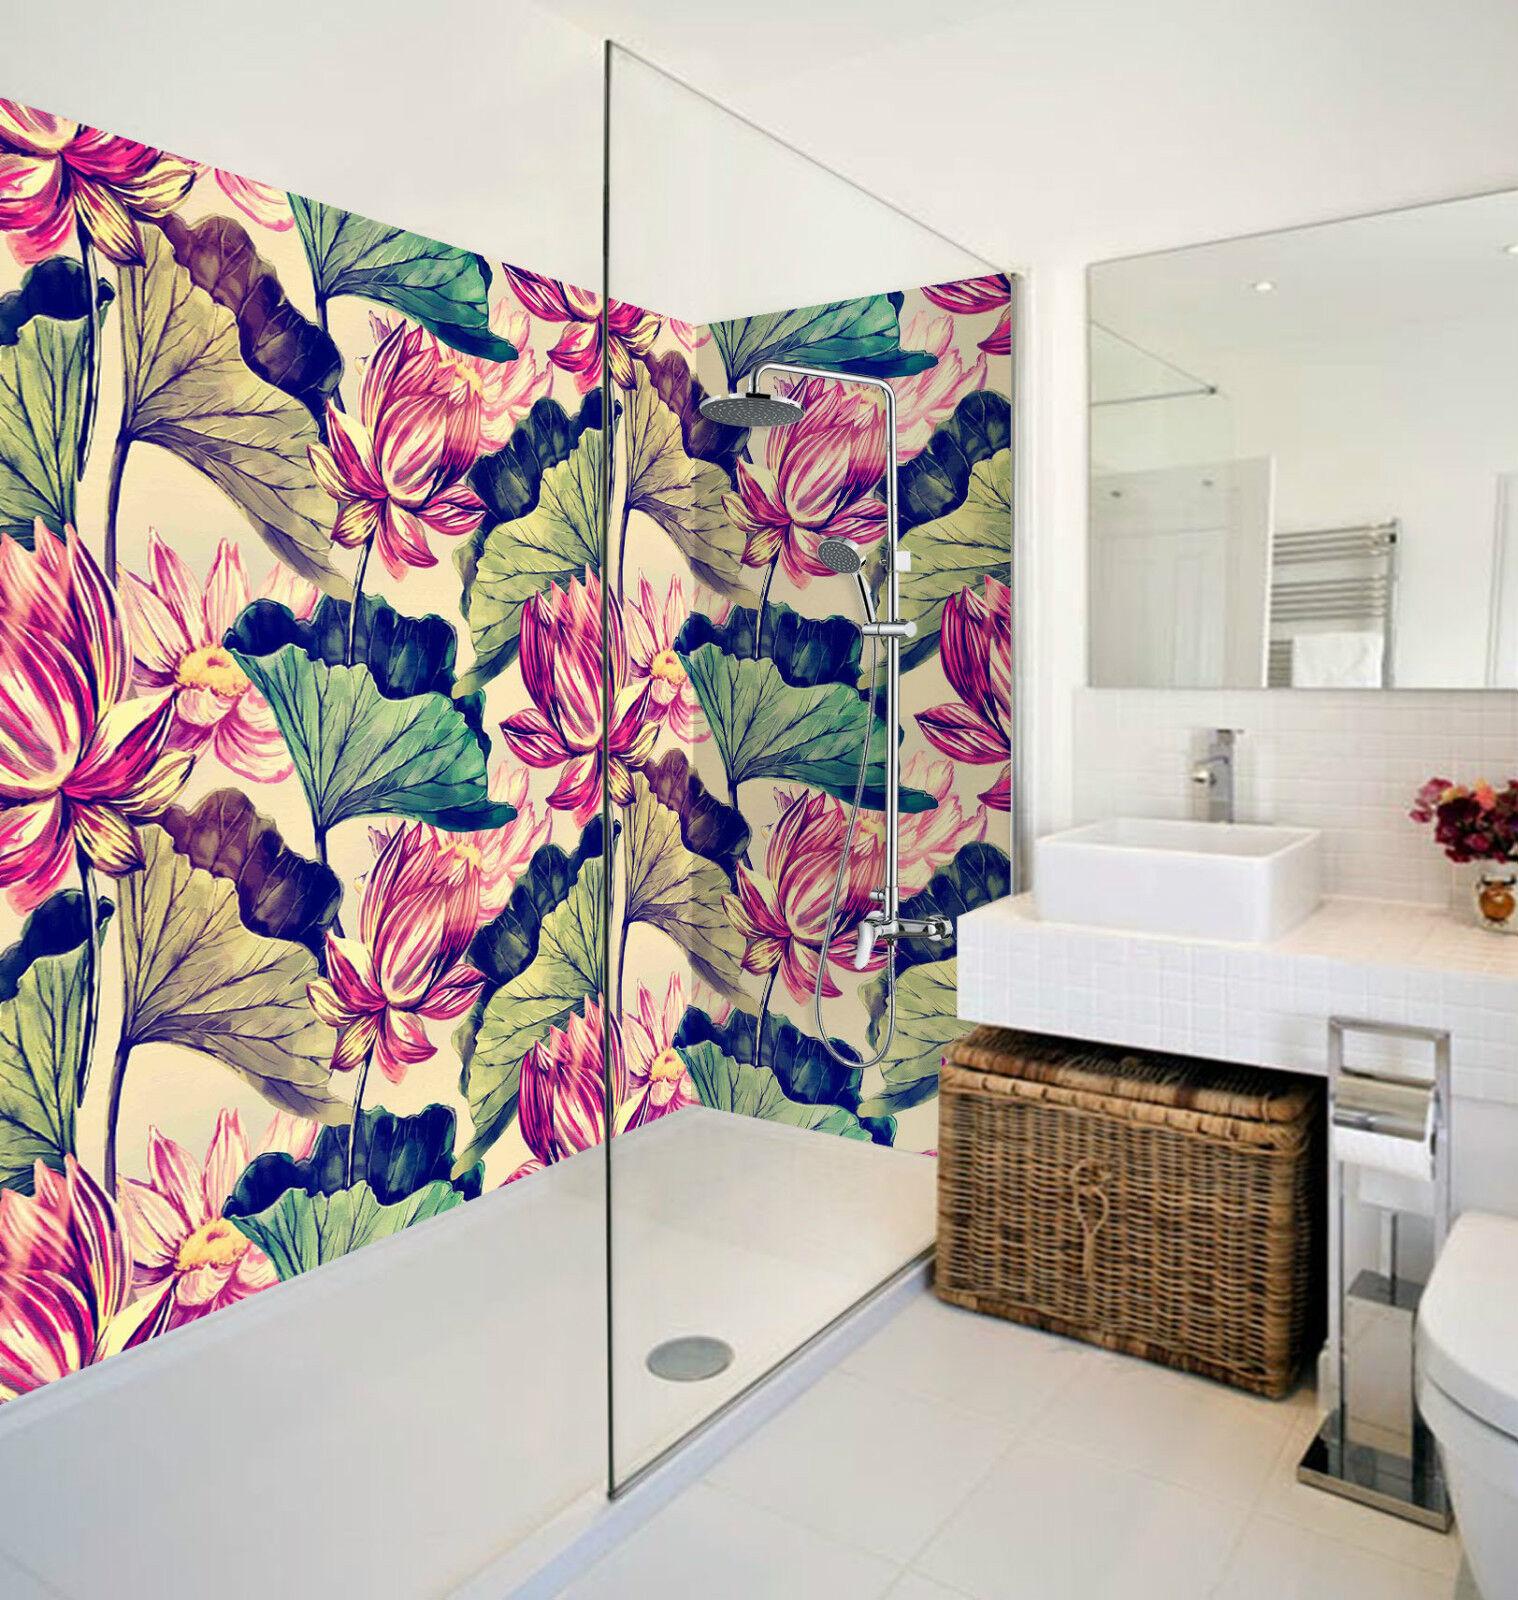 3D Lotus Painting 031 WallPaper Bathroom Print Decal Wall Deco AJ WALLPAPER CA